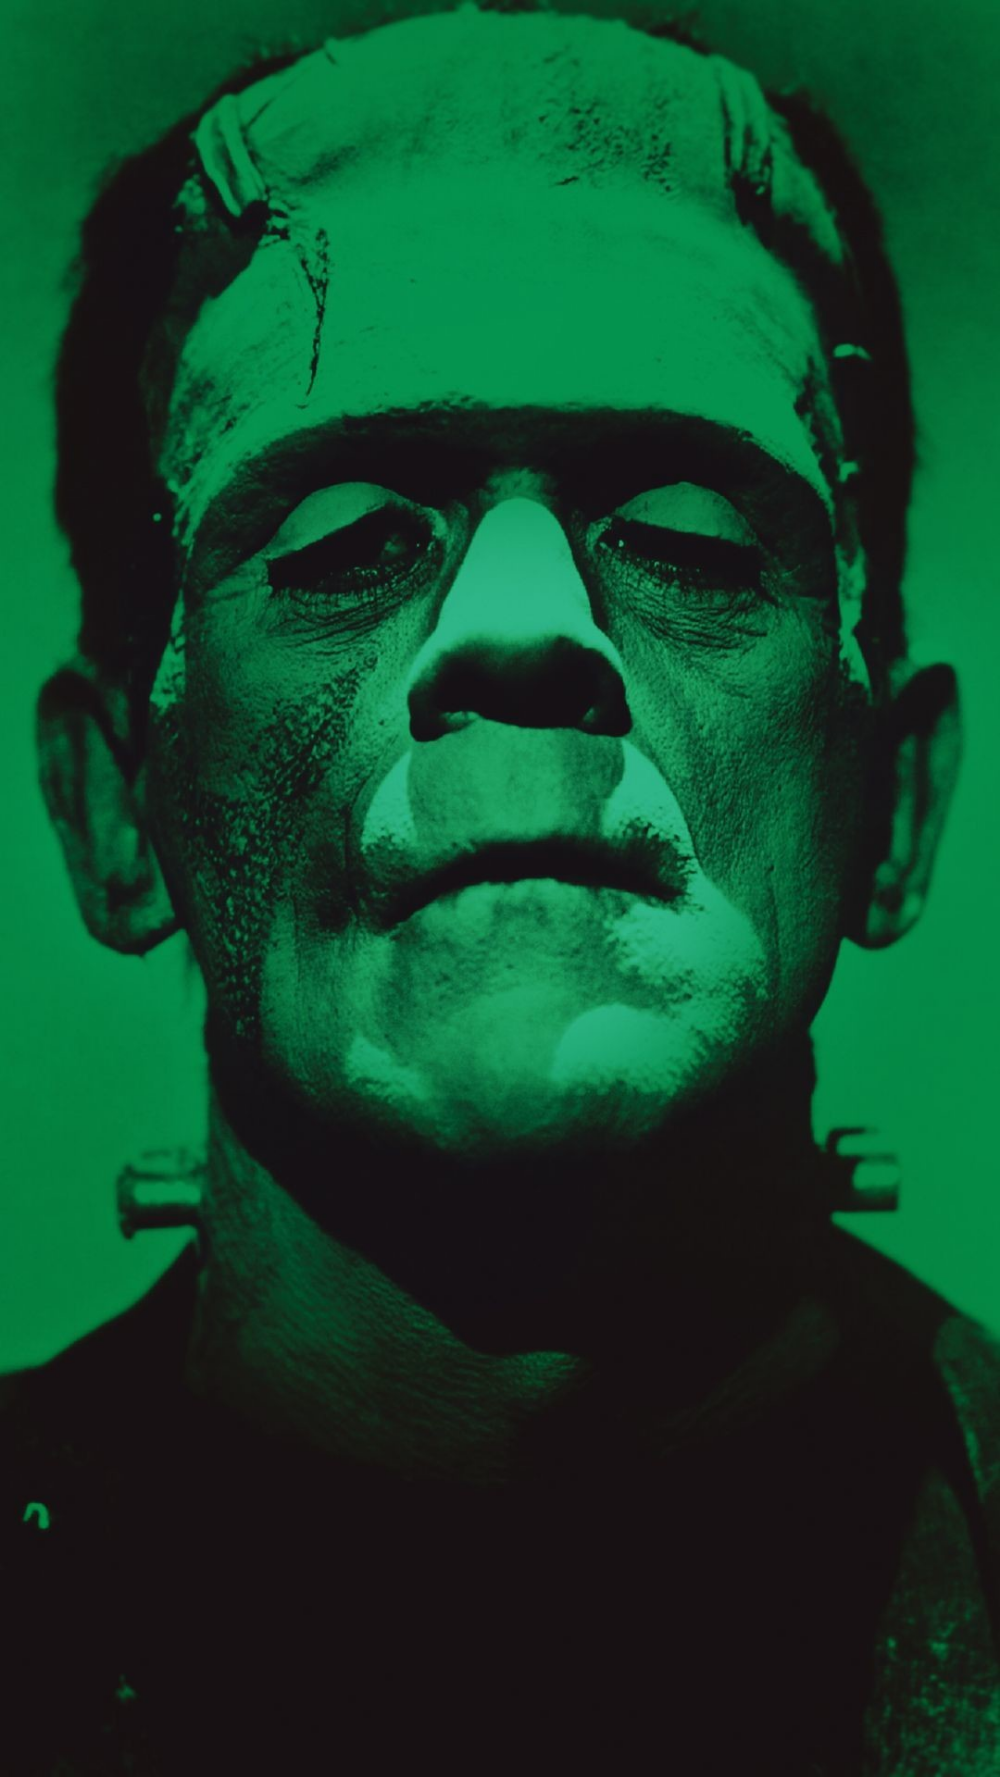 Frankenstein Desktop Wallpaper 72 Images Halloween Wallpaper Frankenstein Green Aesthetic